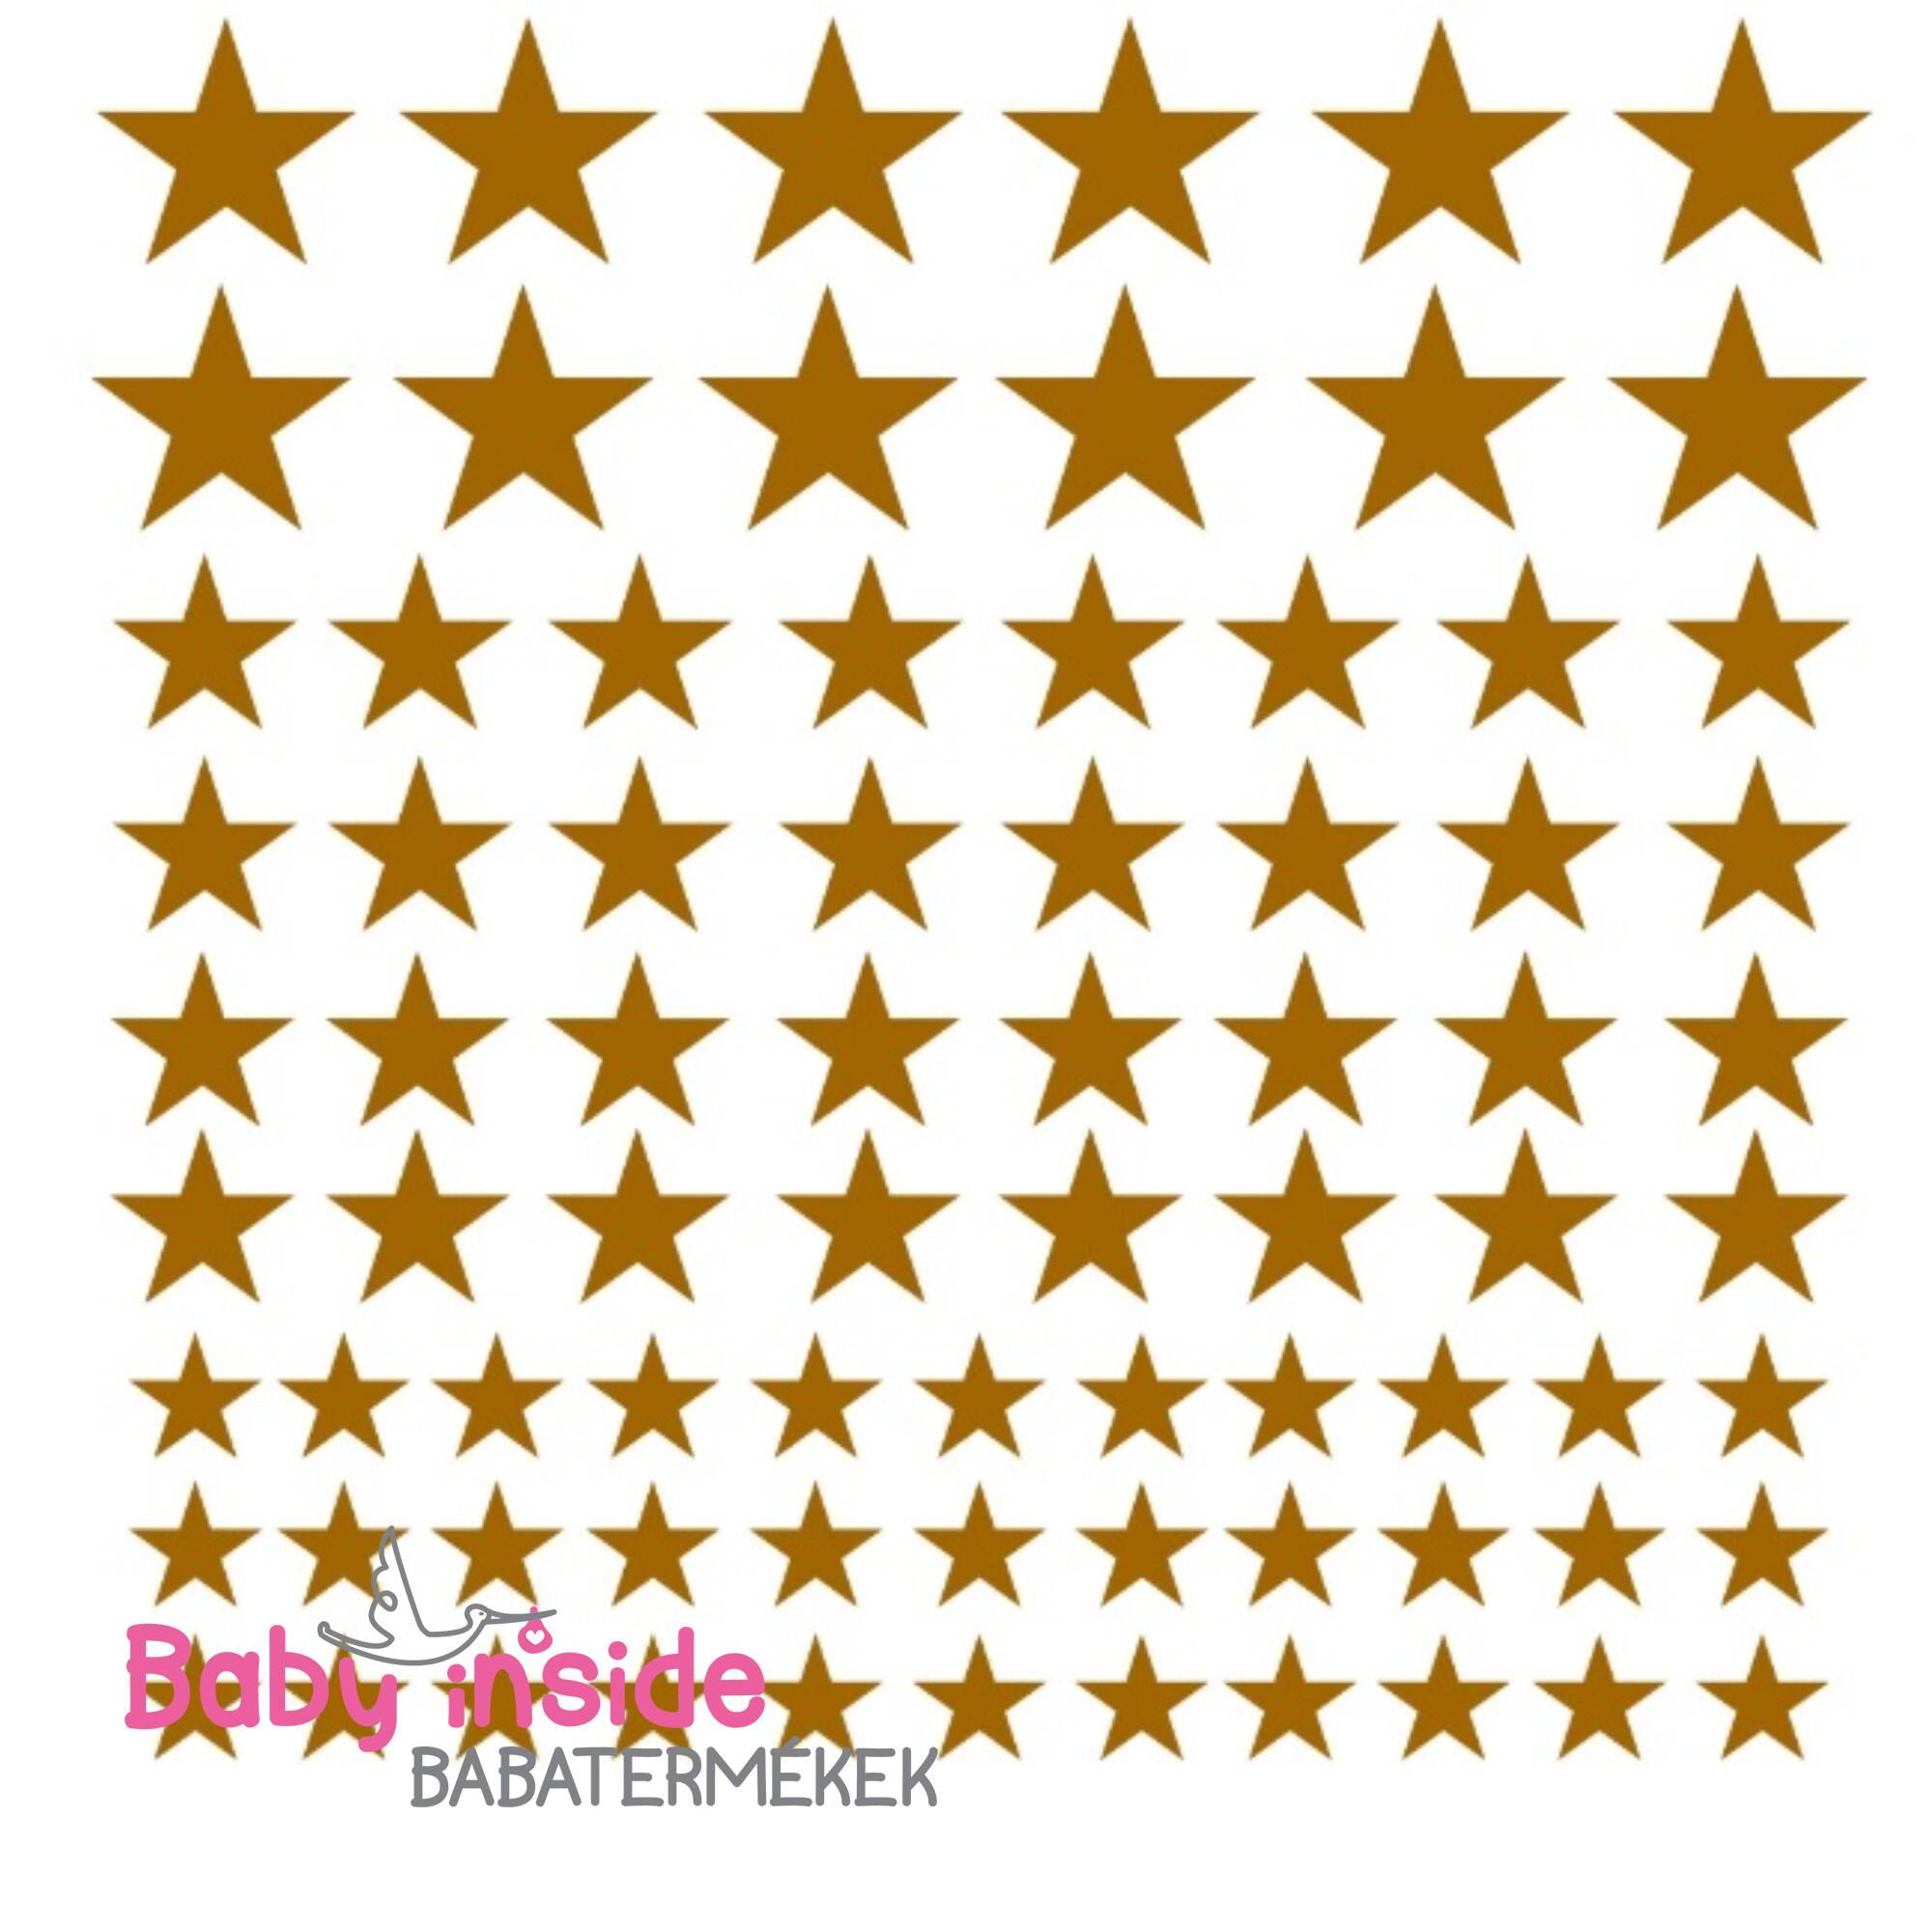 Falmatrica arany csillagok